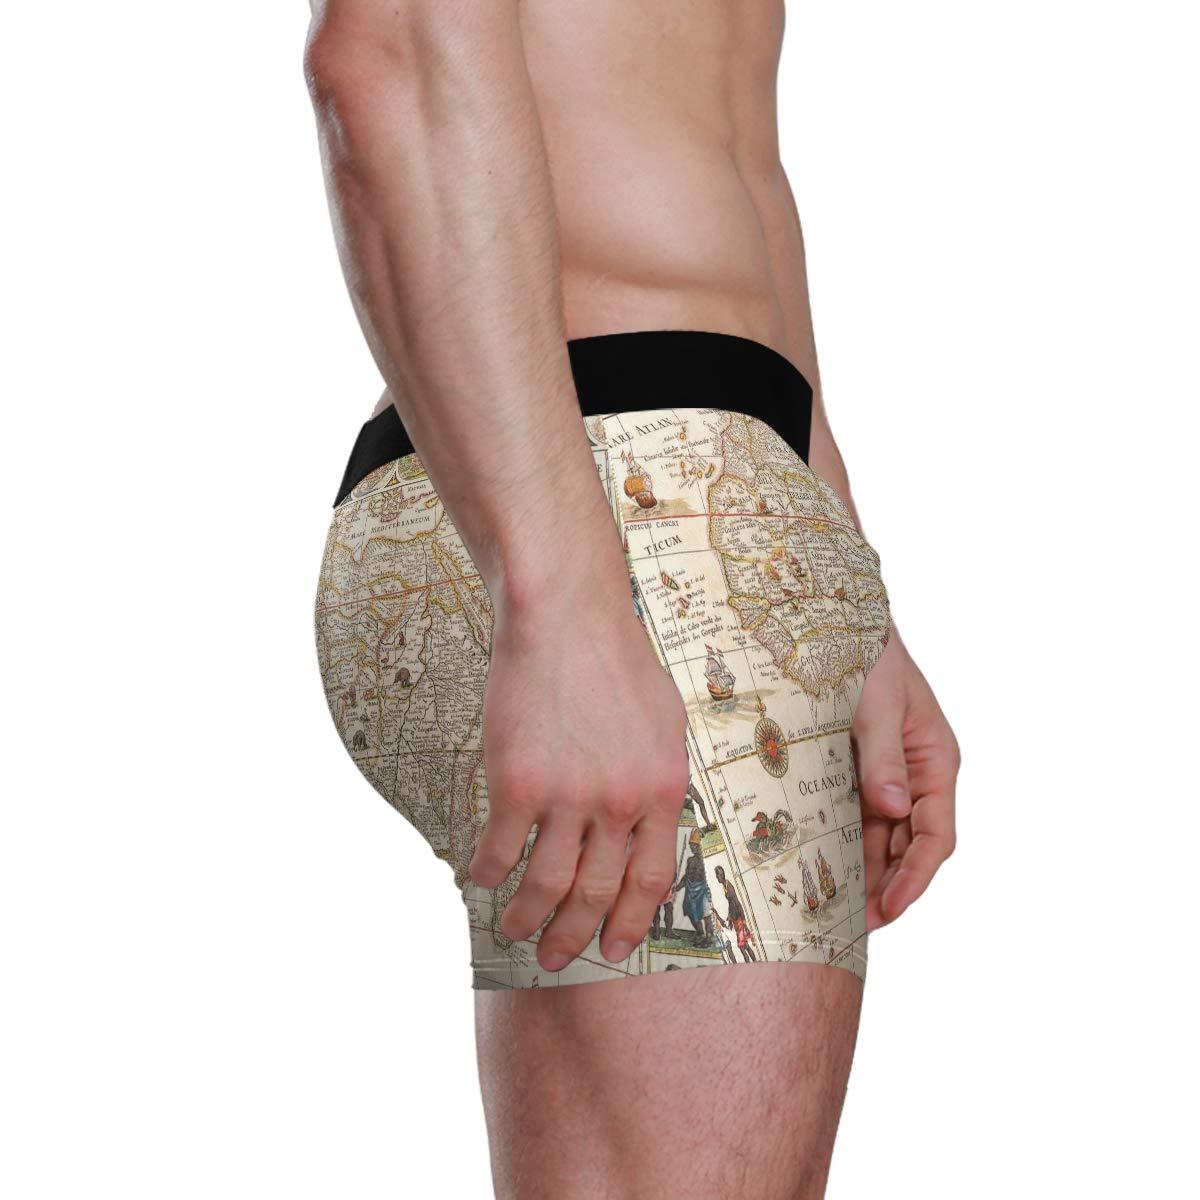 Vipsk Seamless Stretch Mens Polyester Boxer Briefs Underwear 1-Pack Set Retro World Map